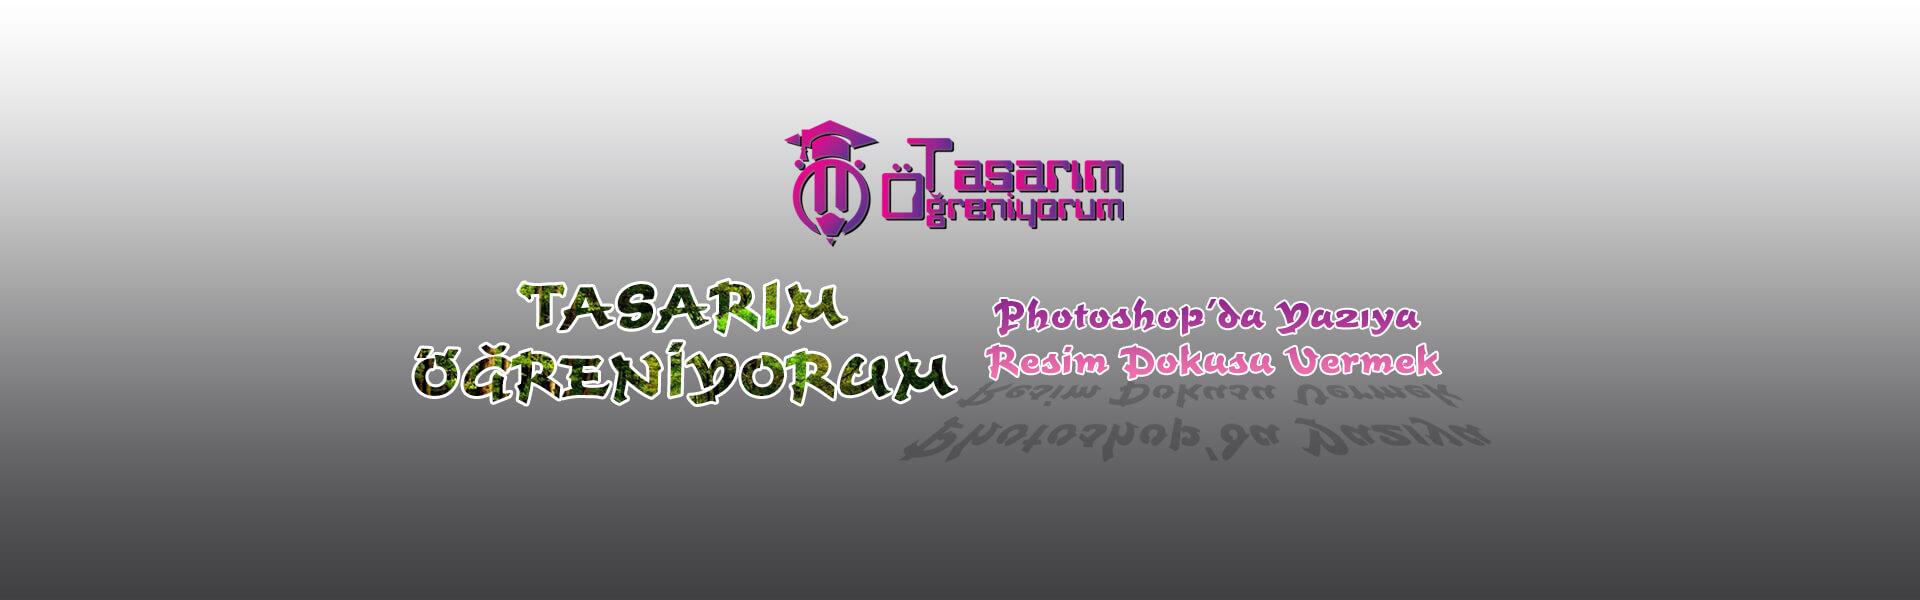 Photo of Photoshop Yazıya Resim Dokusu Vermek